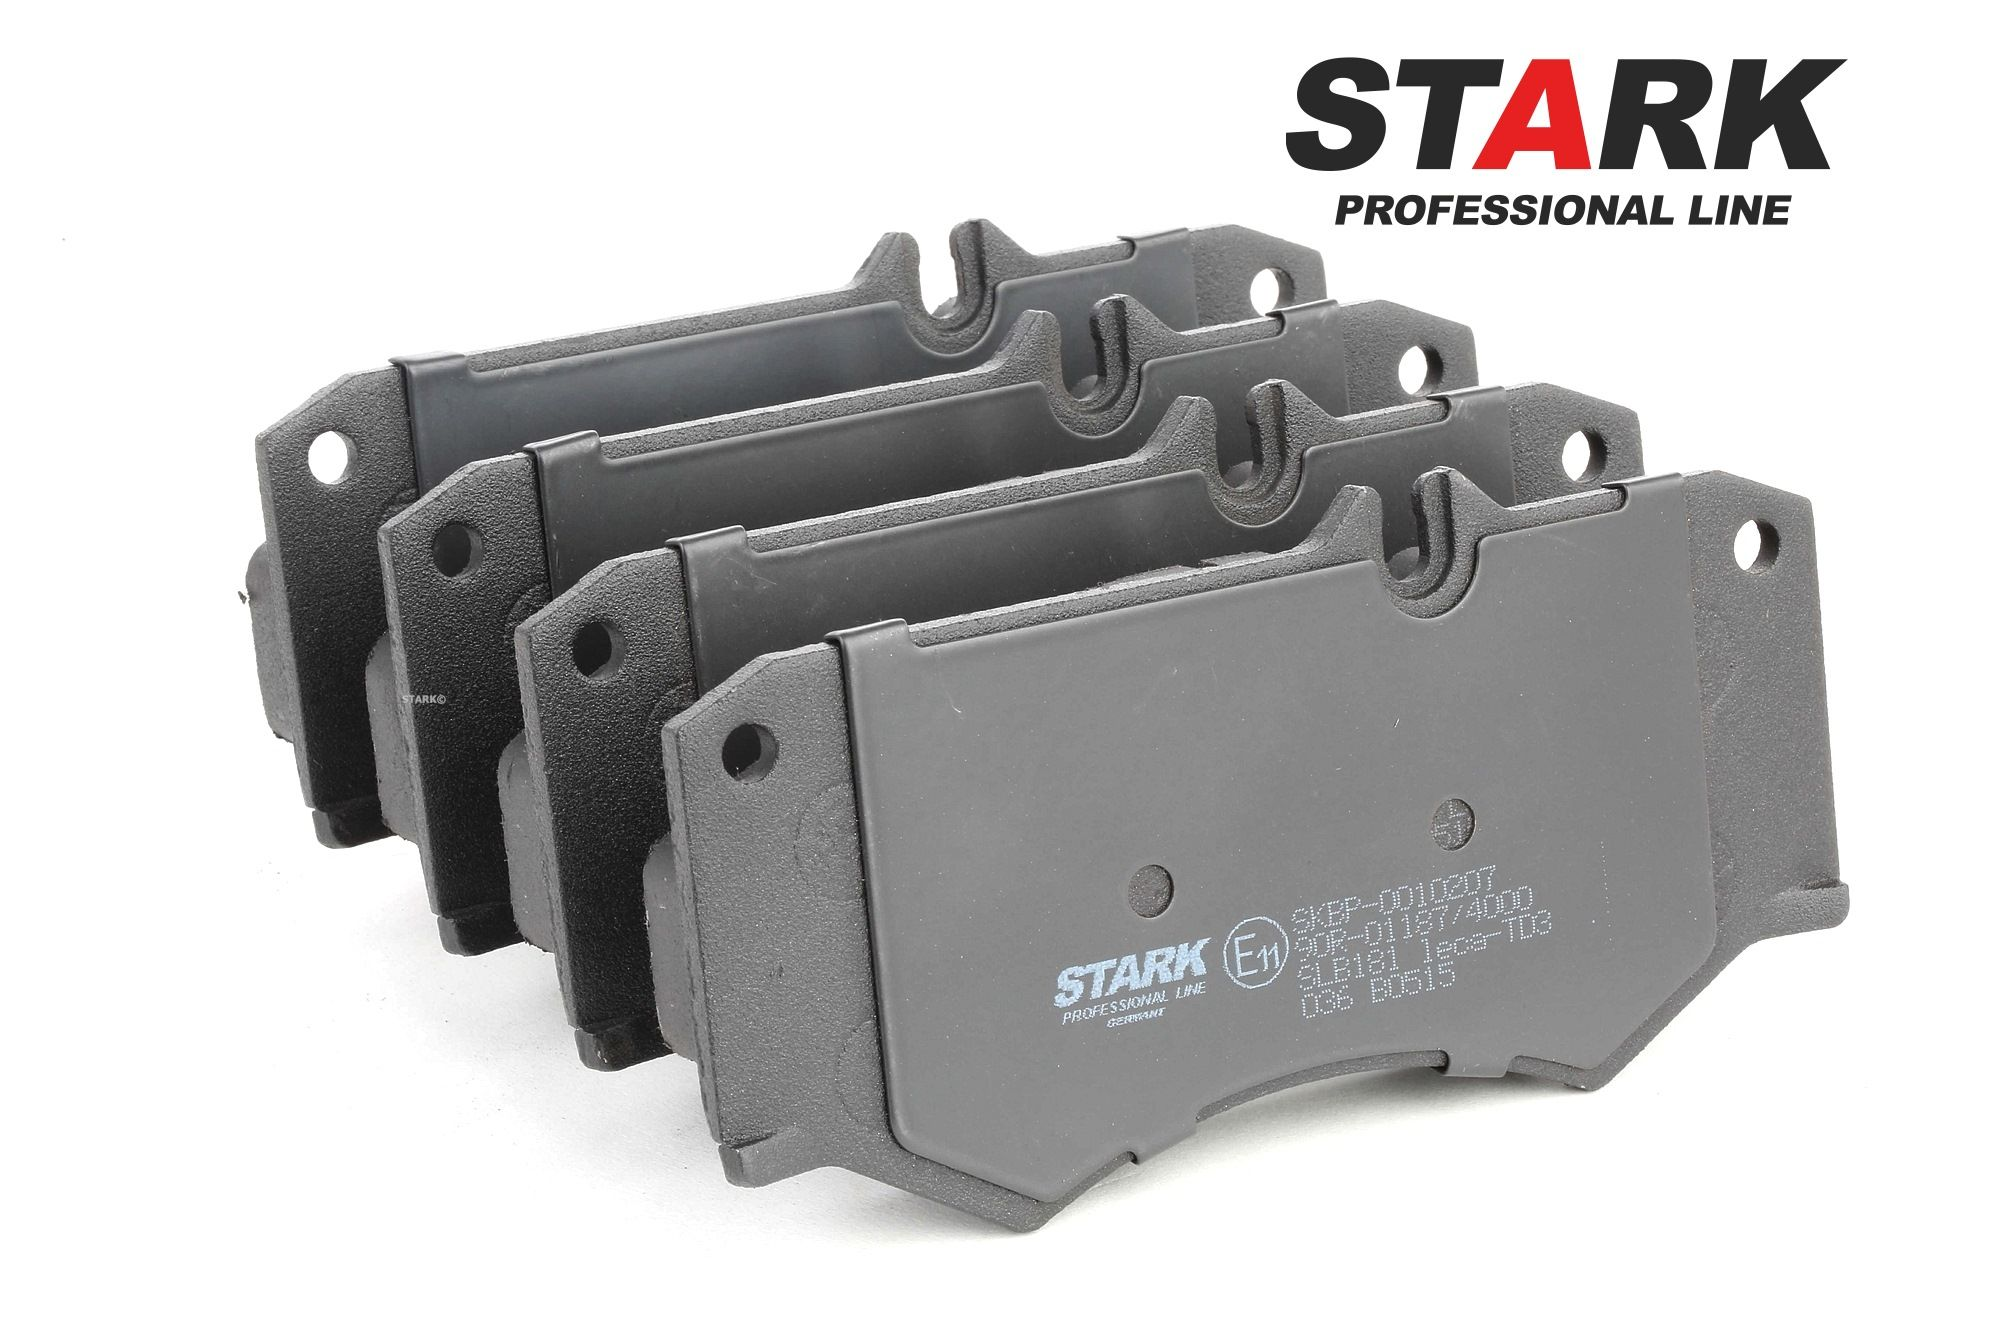 MERCEDES-BENZ T2 1993 Bremsbelagsatz - Original STARK SKBP-0010207 Höhe: 75mm, Breite: 149mm, Dicke/Stärke: 18mm